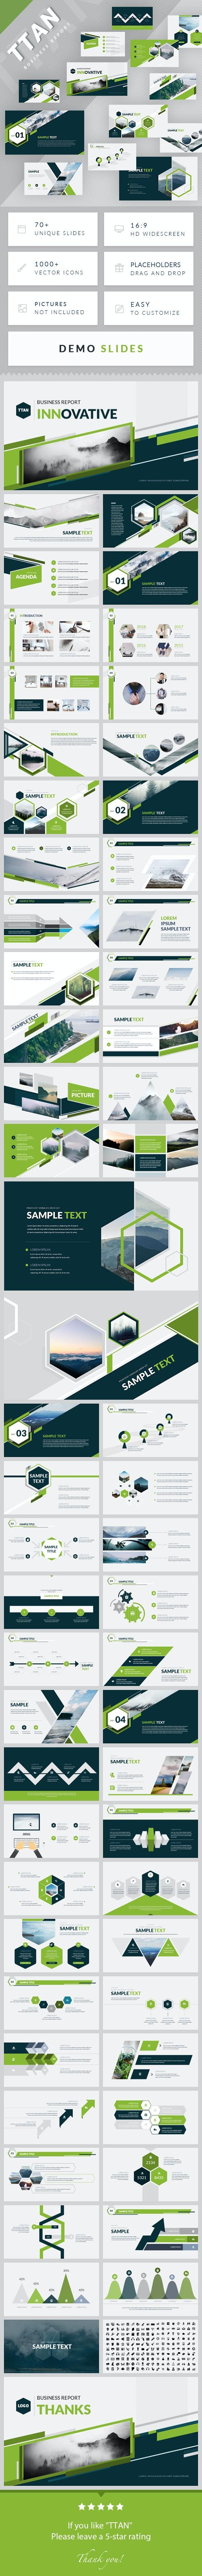 TTAN - PowerPoint Presentation Template - Business PowerPoint Templates